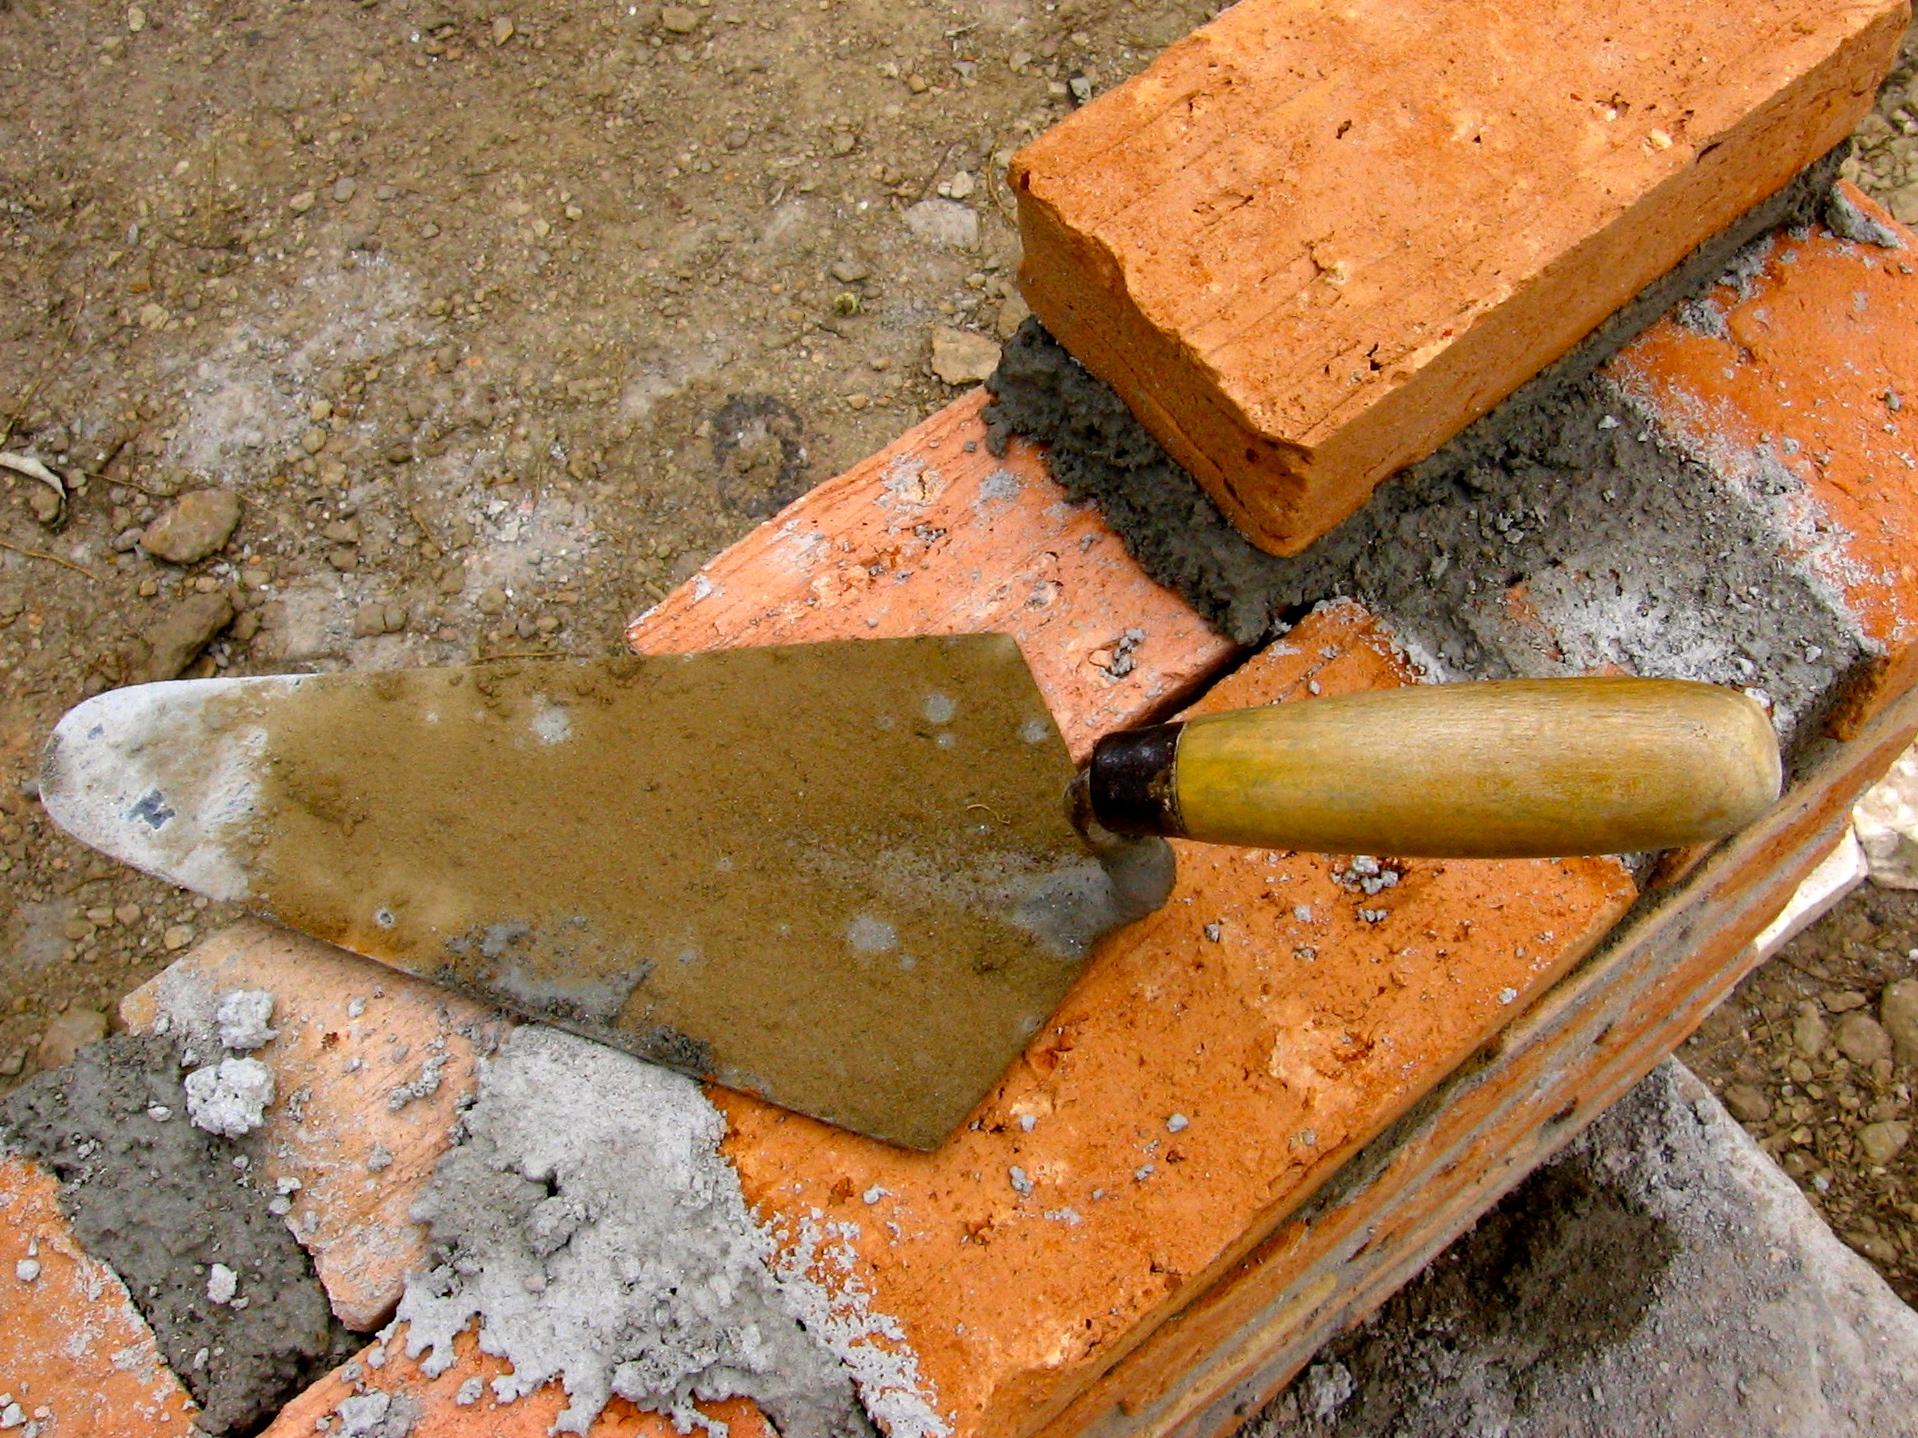 Spring Stewardship: 5 Ways to Lay a Firm Foundation